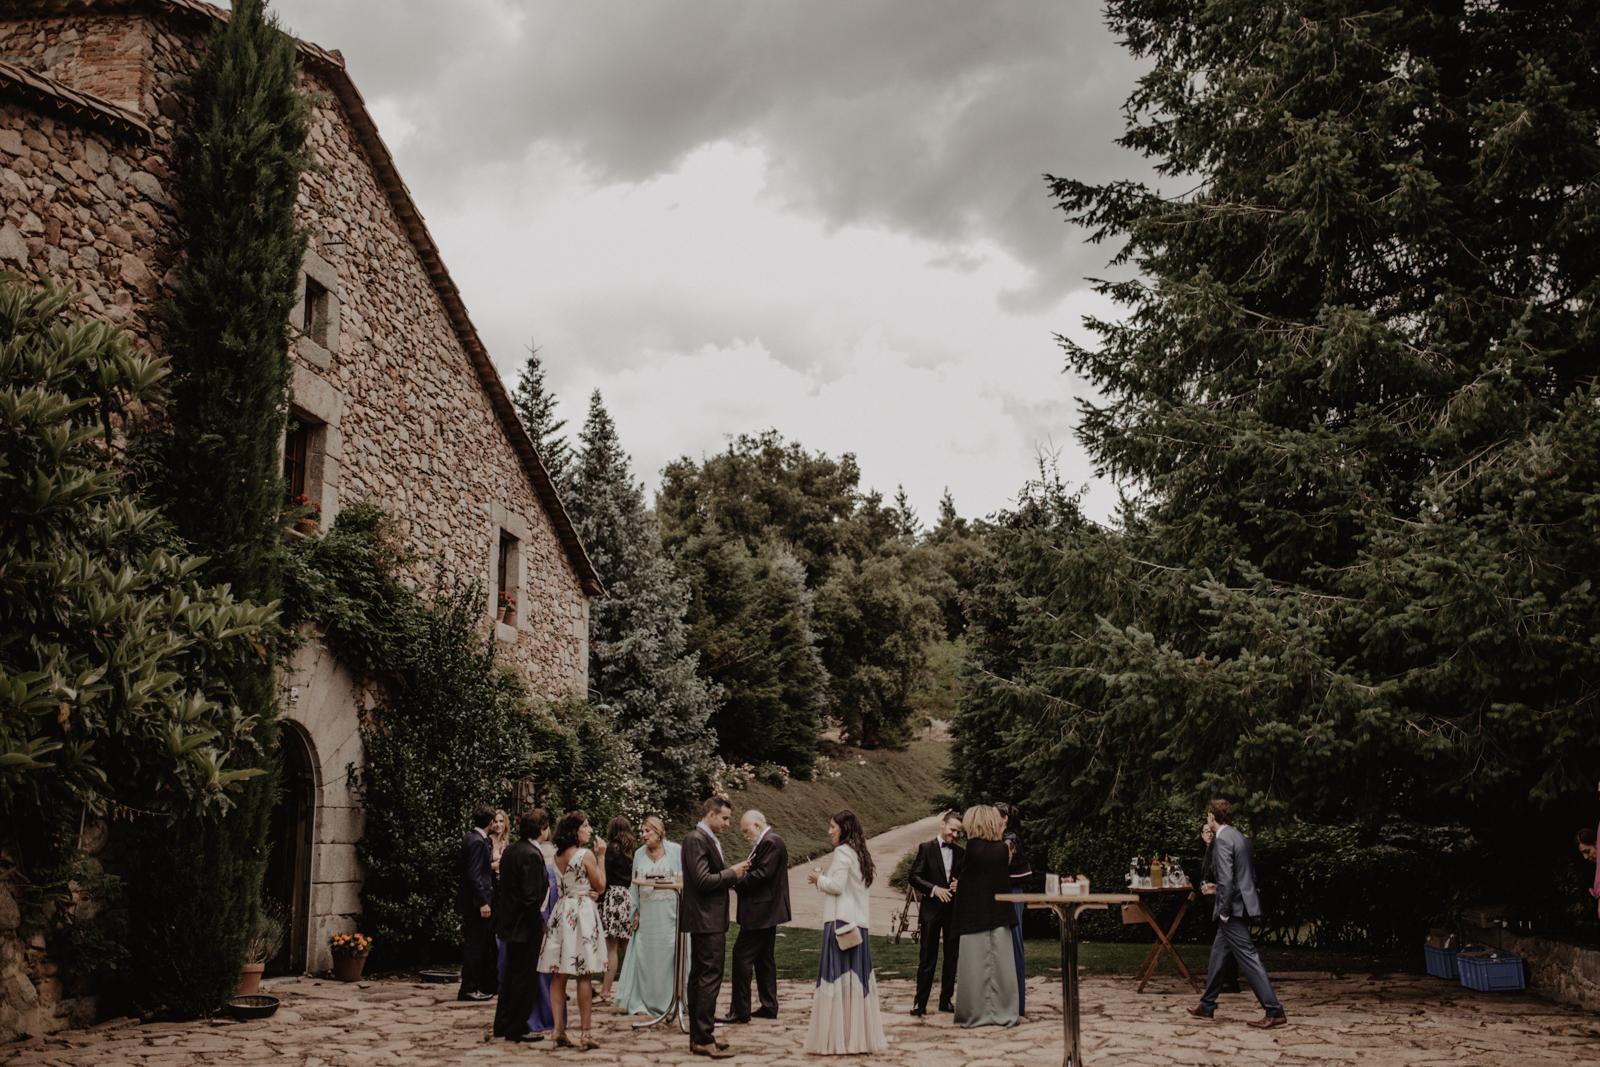 thenortherngirlphotography_photography_thenortherngirl_rebeccascabros_wedding_weddingphotography_weddingphotographer_barcelona_bodaenbarcelona_bodaenmaselmarti_bodarogeryvane-271.jpg